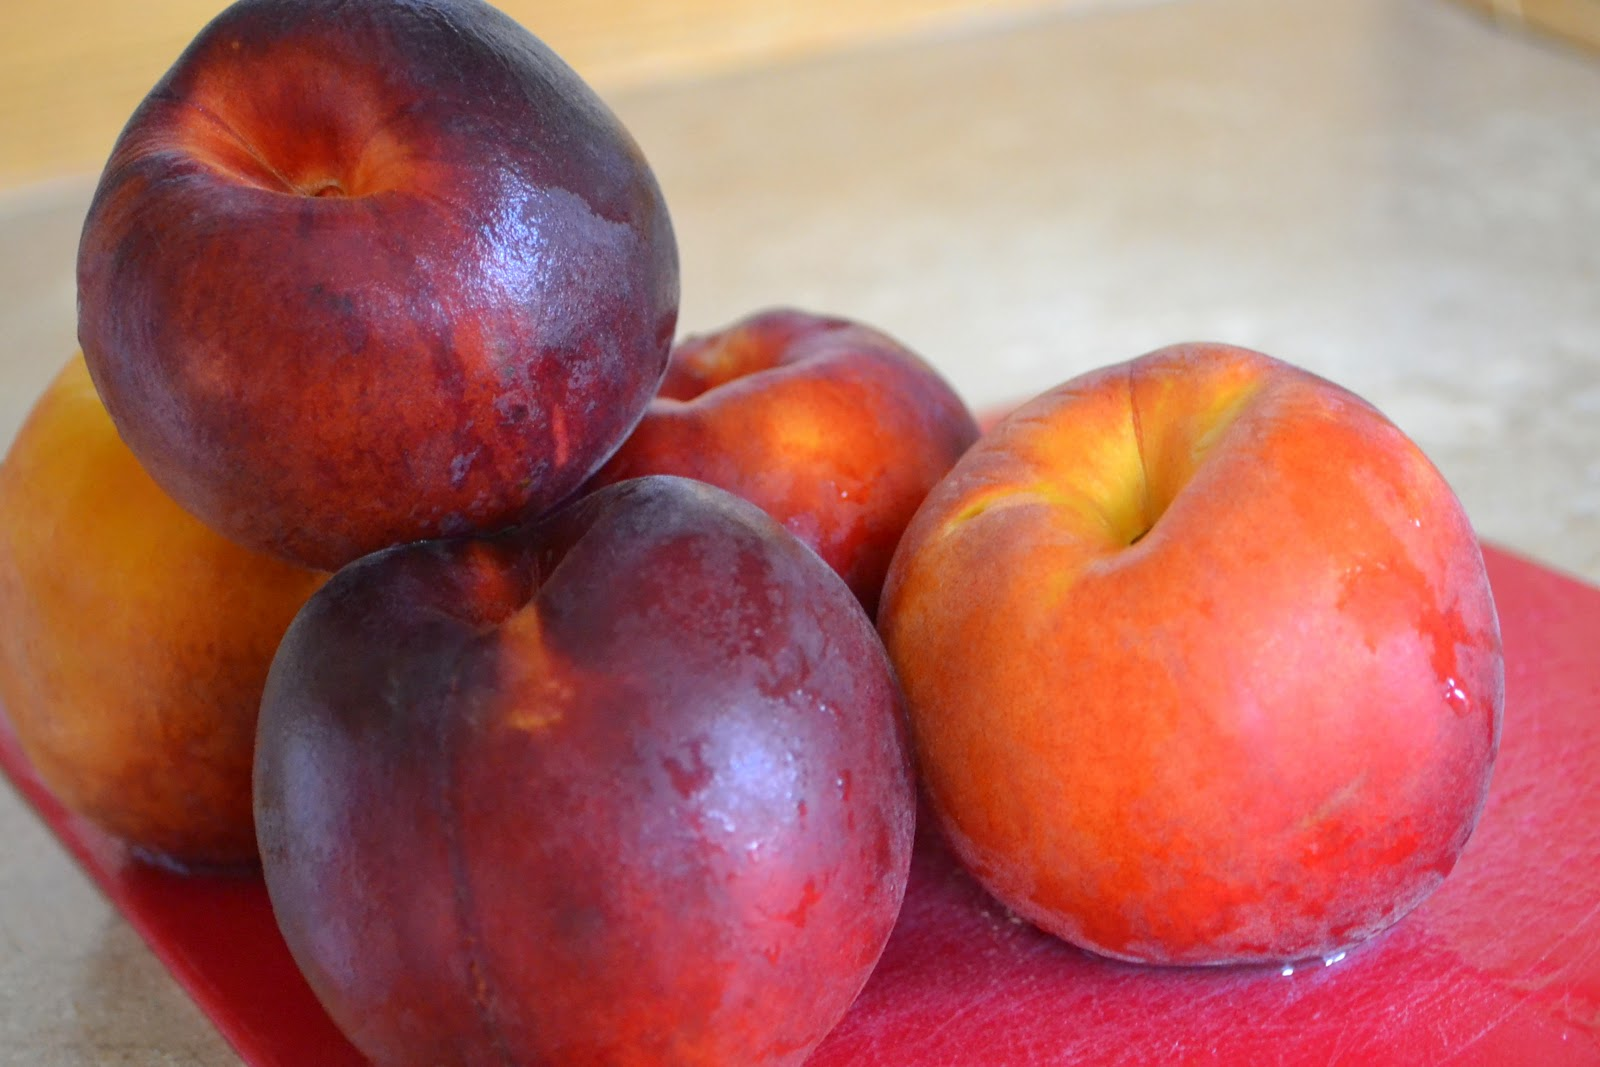 Homemade Peach Fruit Leather (she: Angela) - Or so she says...